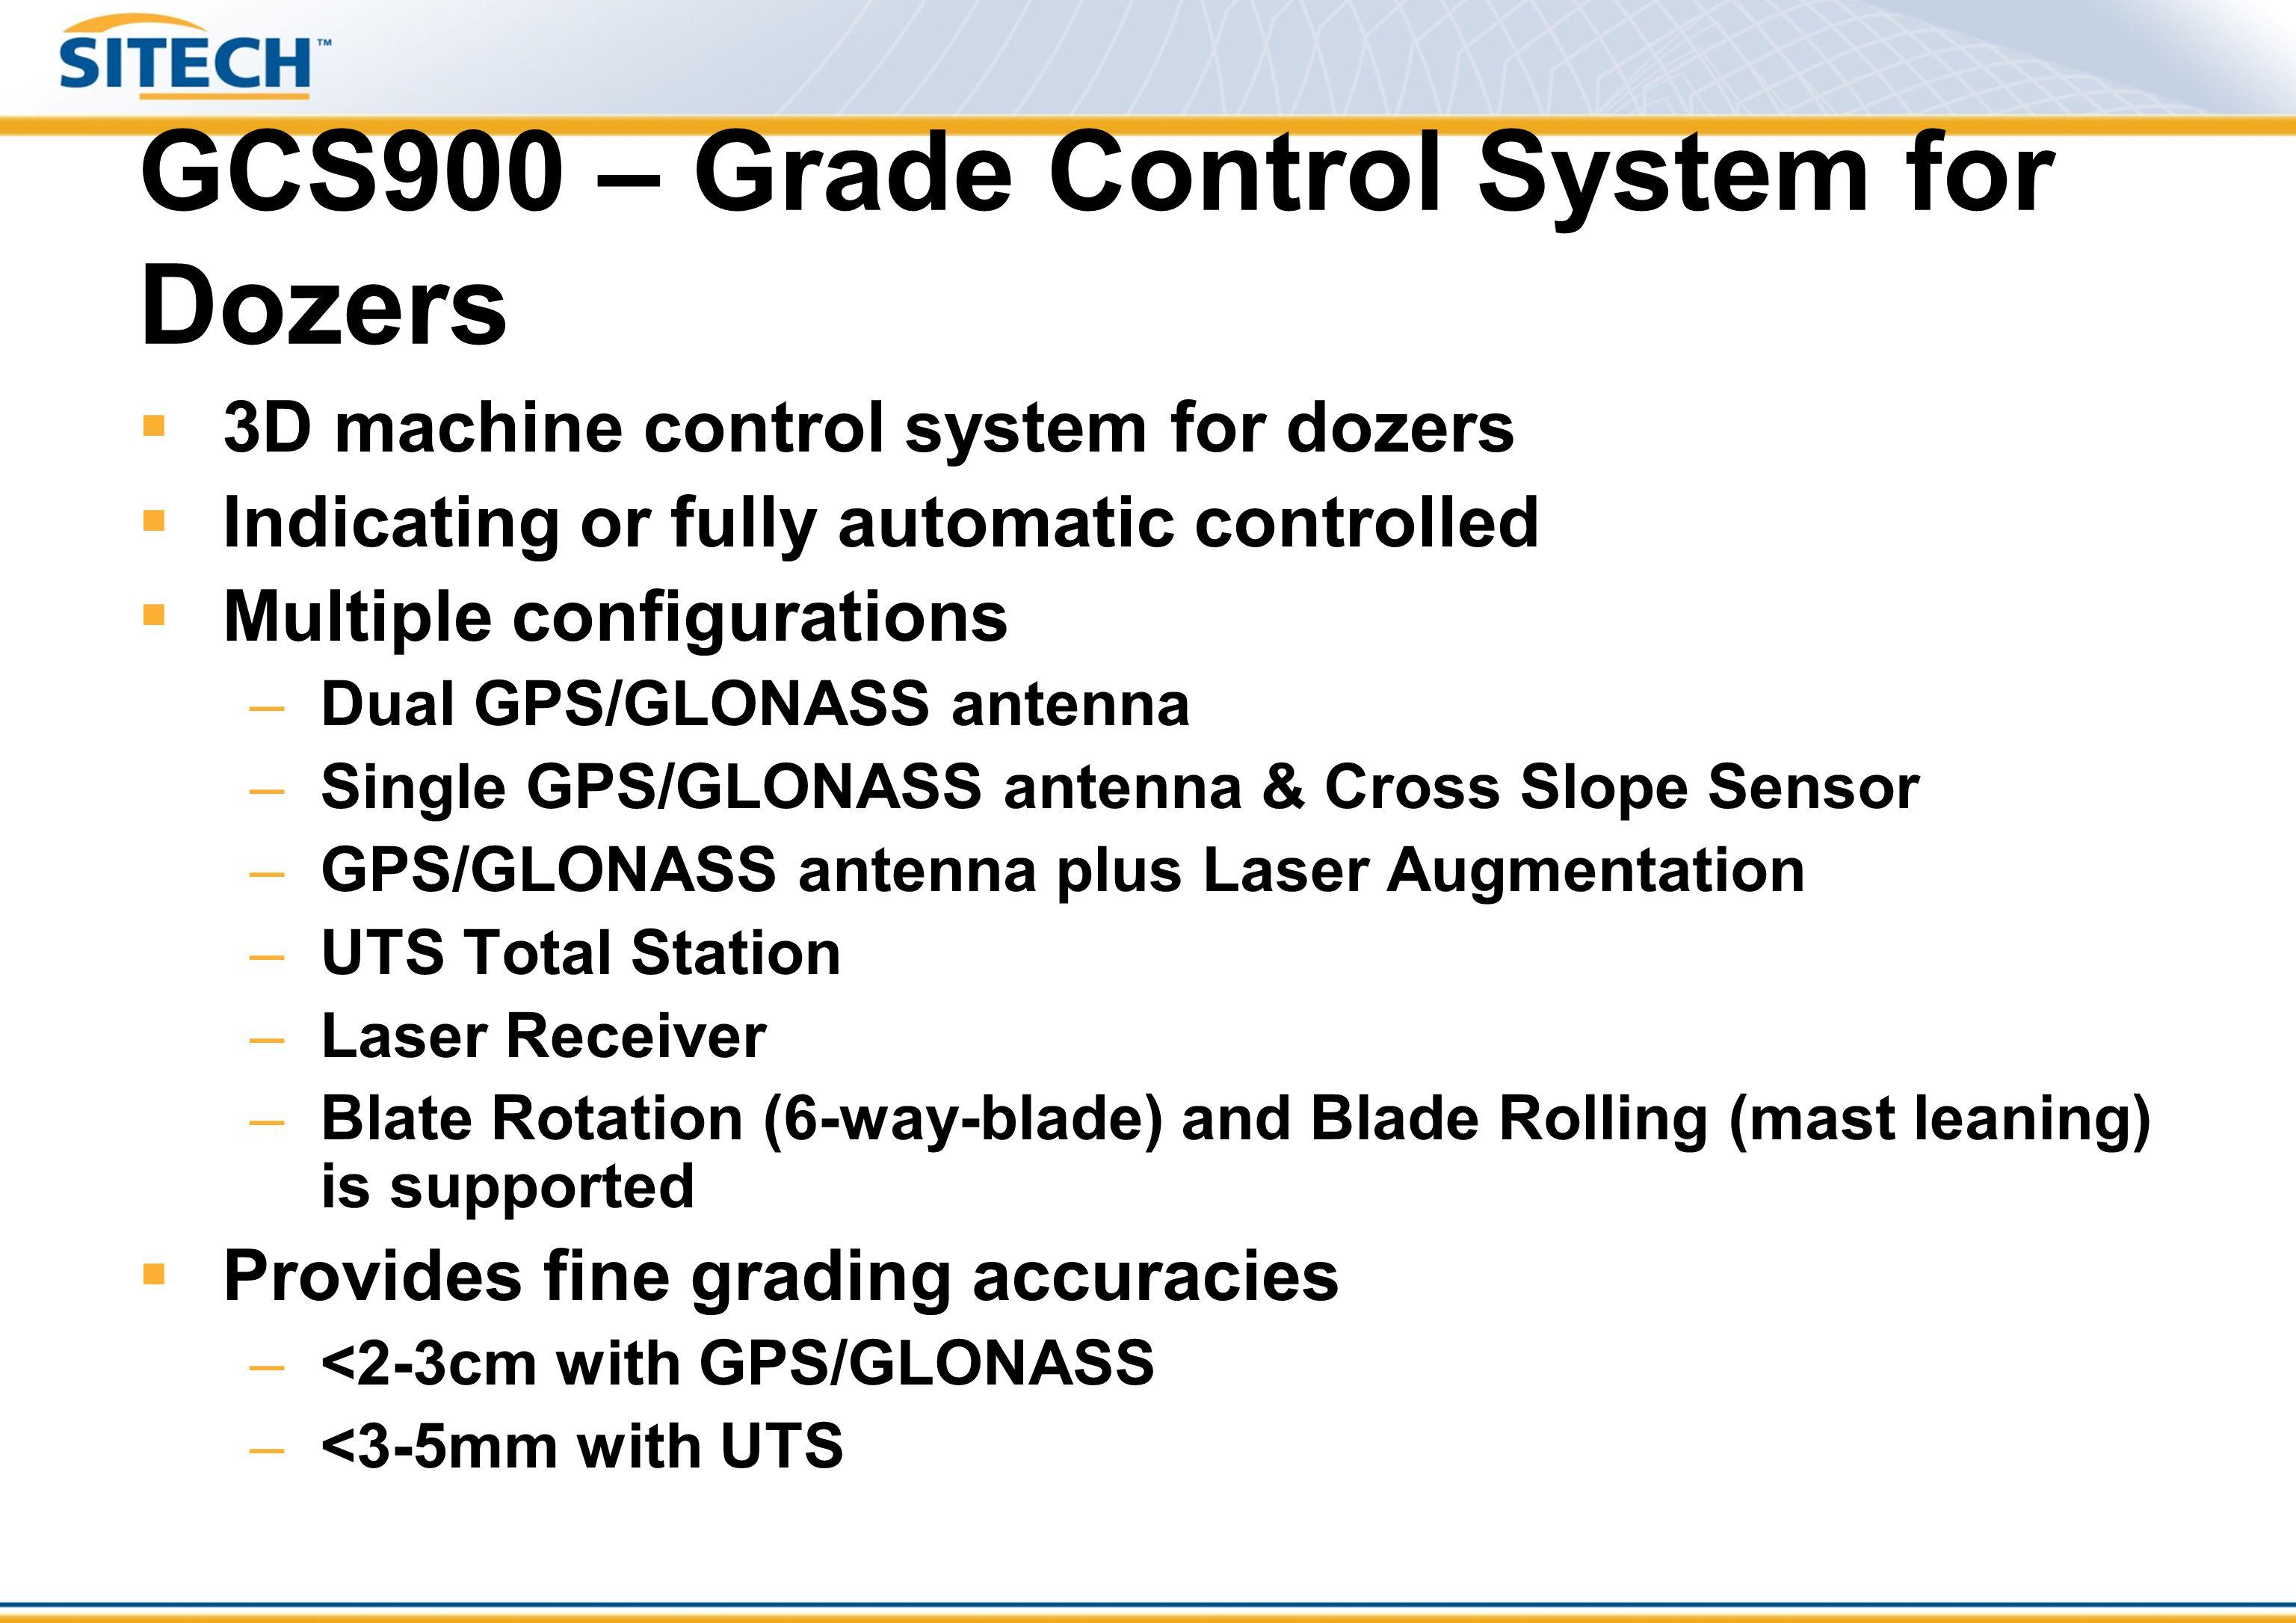 Trimble GCS900: 3D Dozer – UTS & Cross-slope Harness Power Module PM400 Valve Module VM4X0 Crossfall Sensor AS400 Rotation Sensor RS400 (optional for blade rotation) Mainfall Sensor AS400 (optional for blade rolling) CB430 LB400 SNRSNM930 or MT900